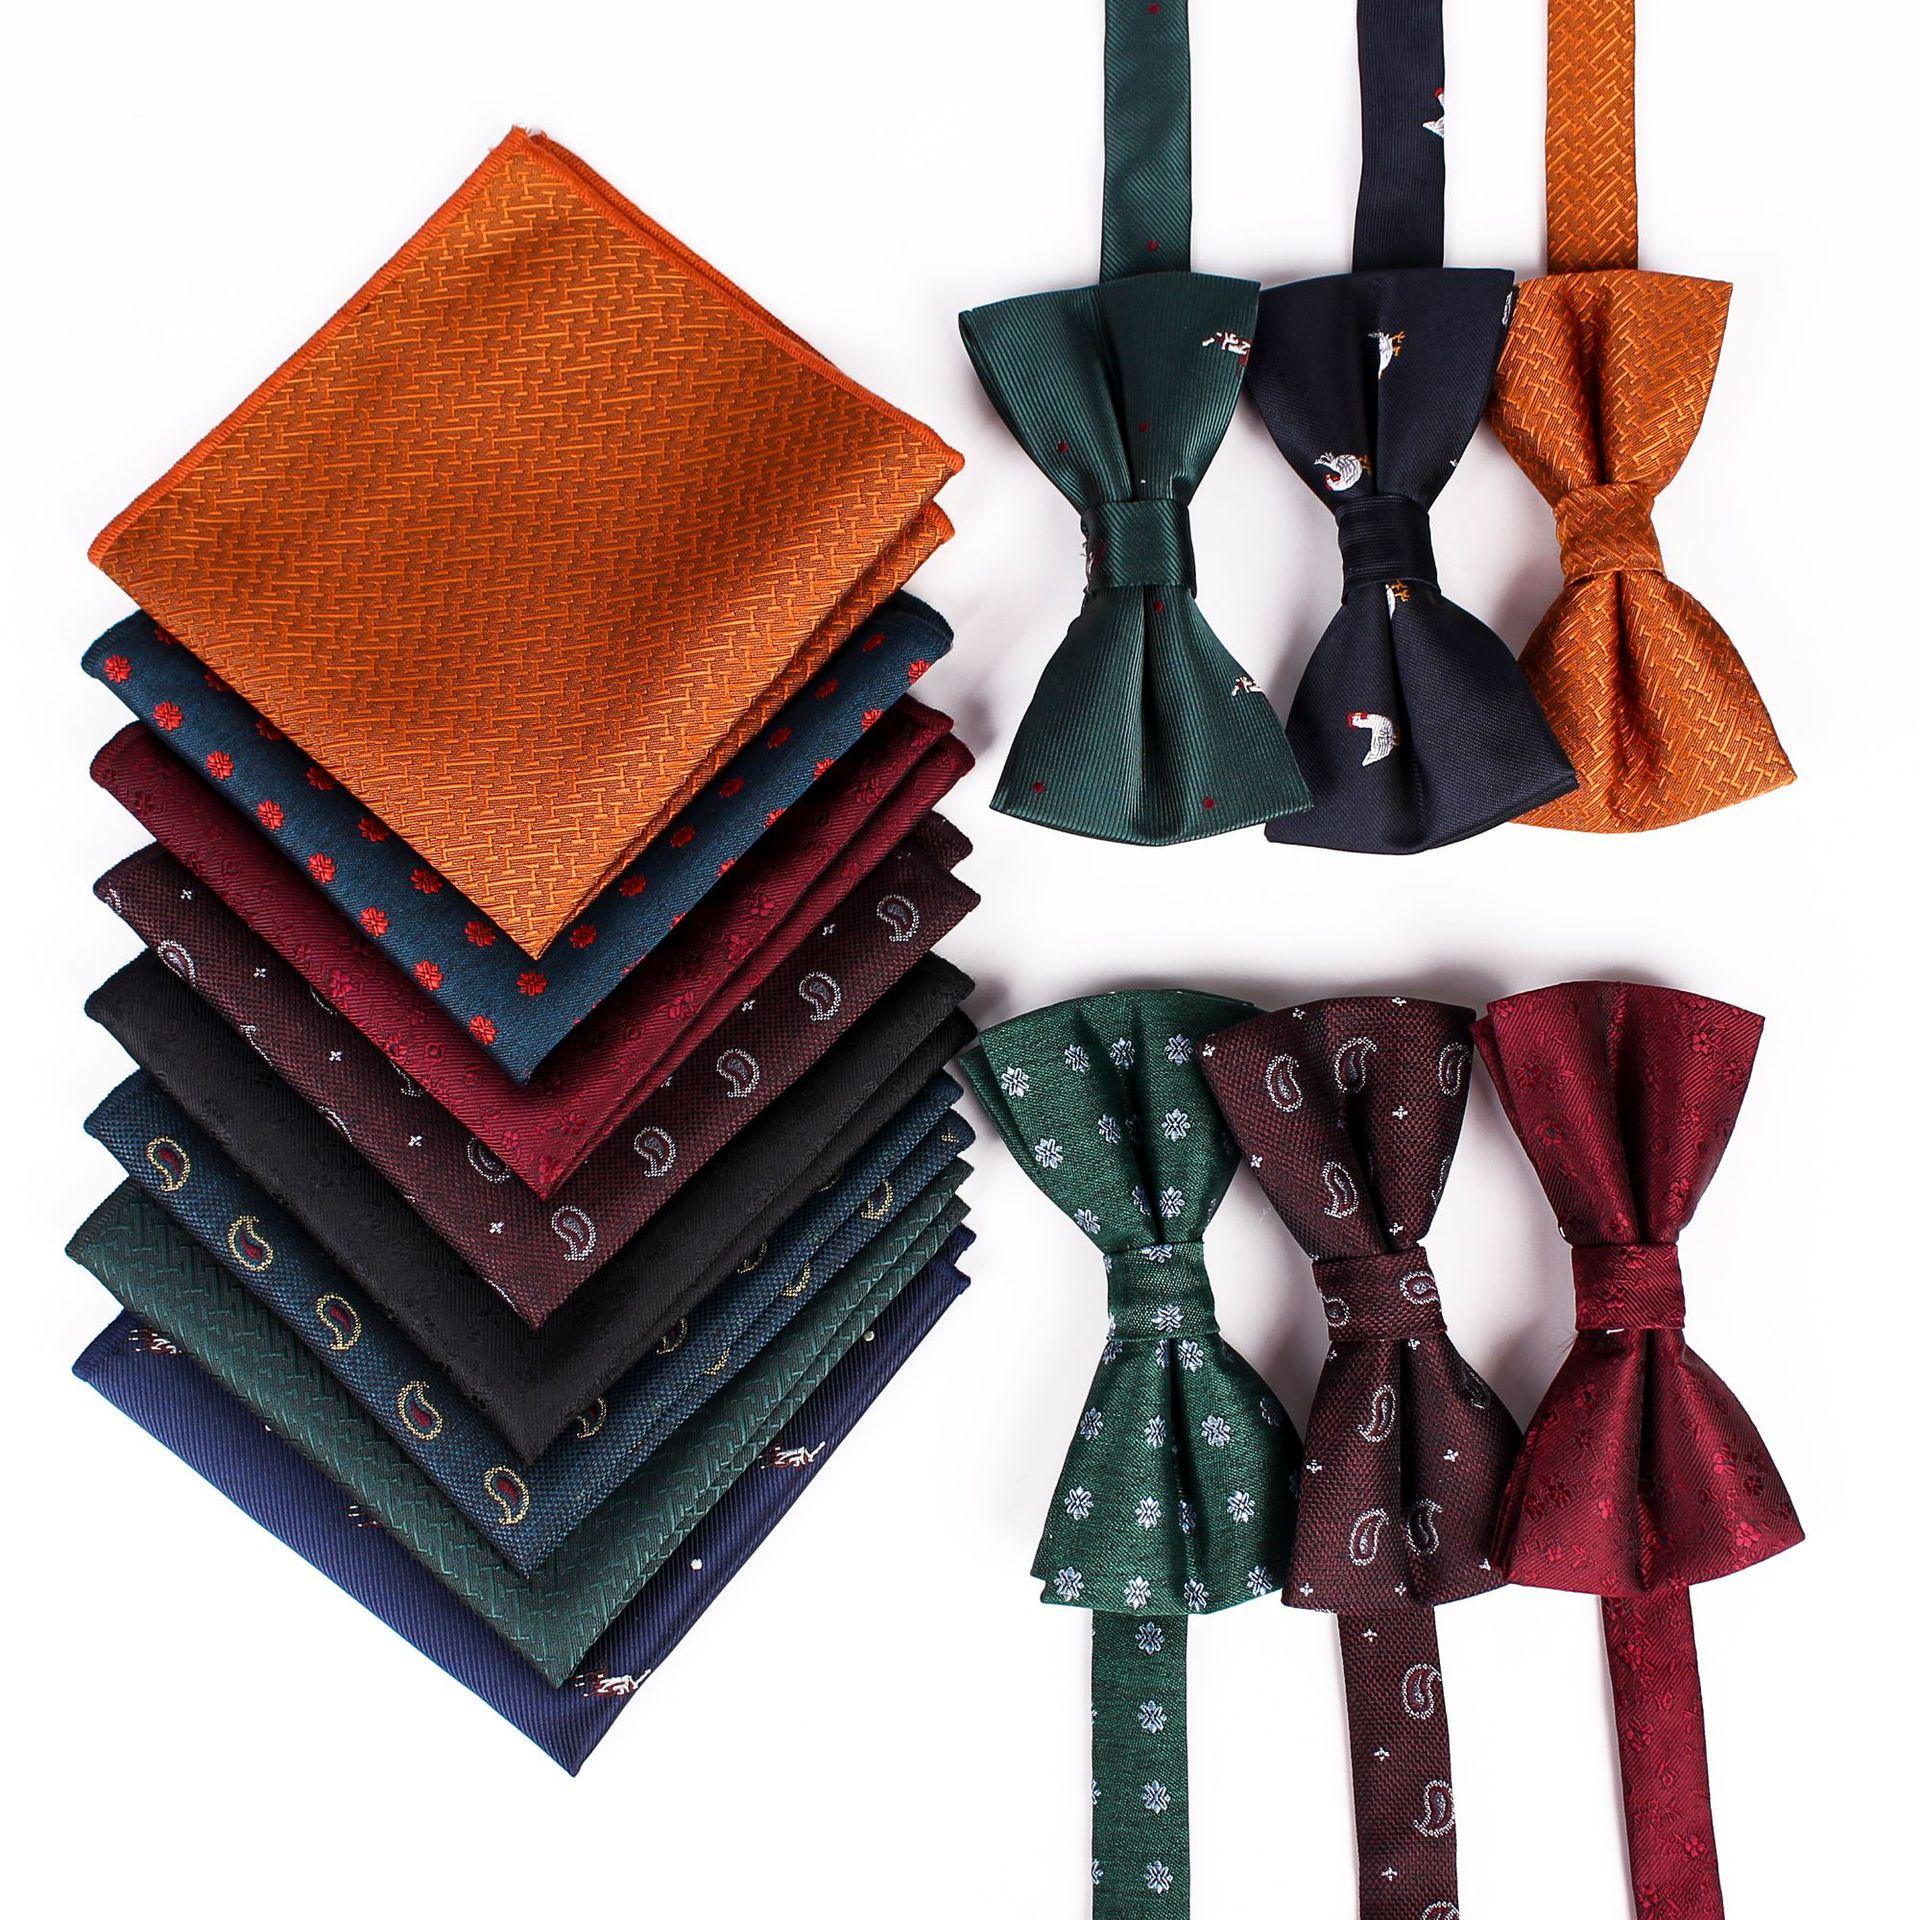 Upscale Men's Bow Tie Pocket Scarf Set Silk Jacquard Party Business Casual  Pocket Scarf Bowtie Wedding Prom Groomsmen Groom